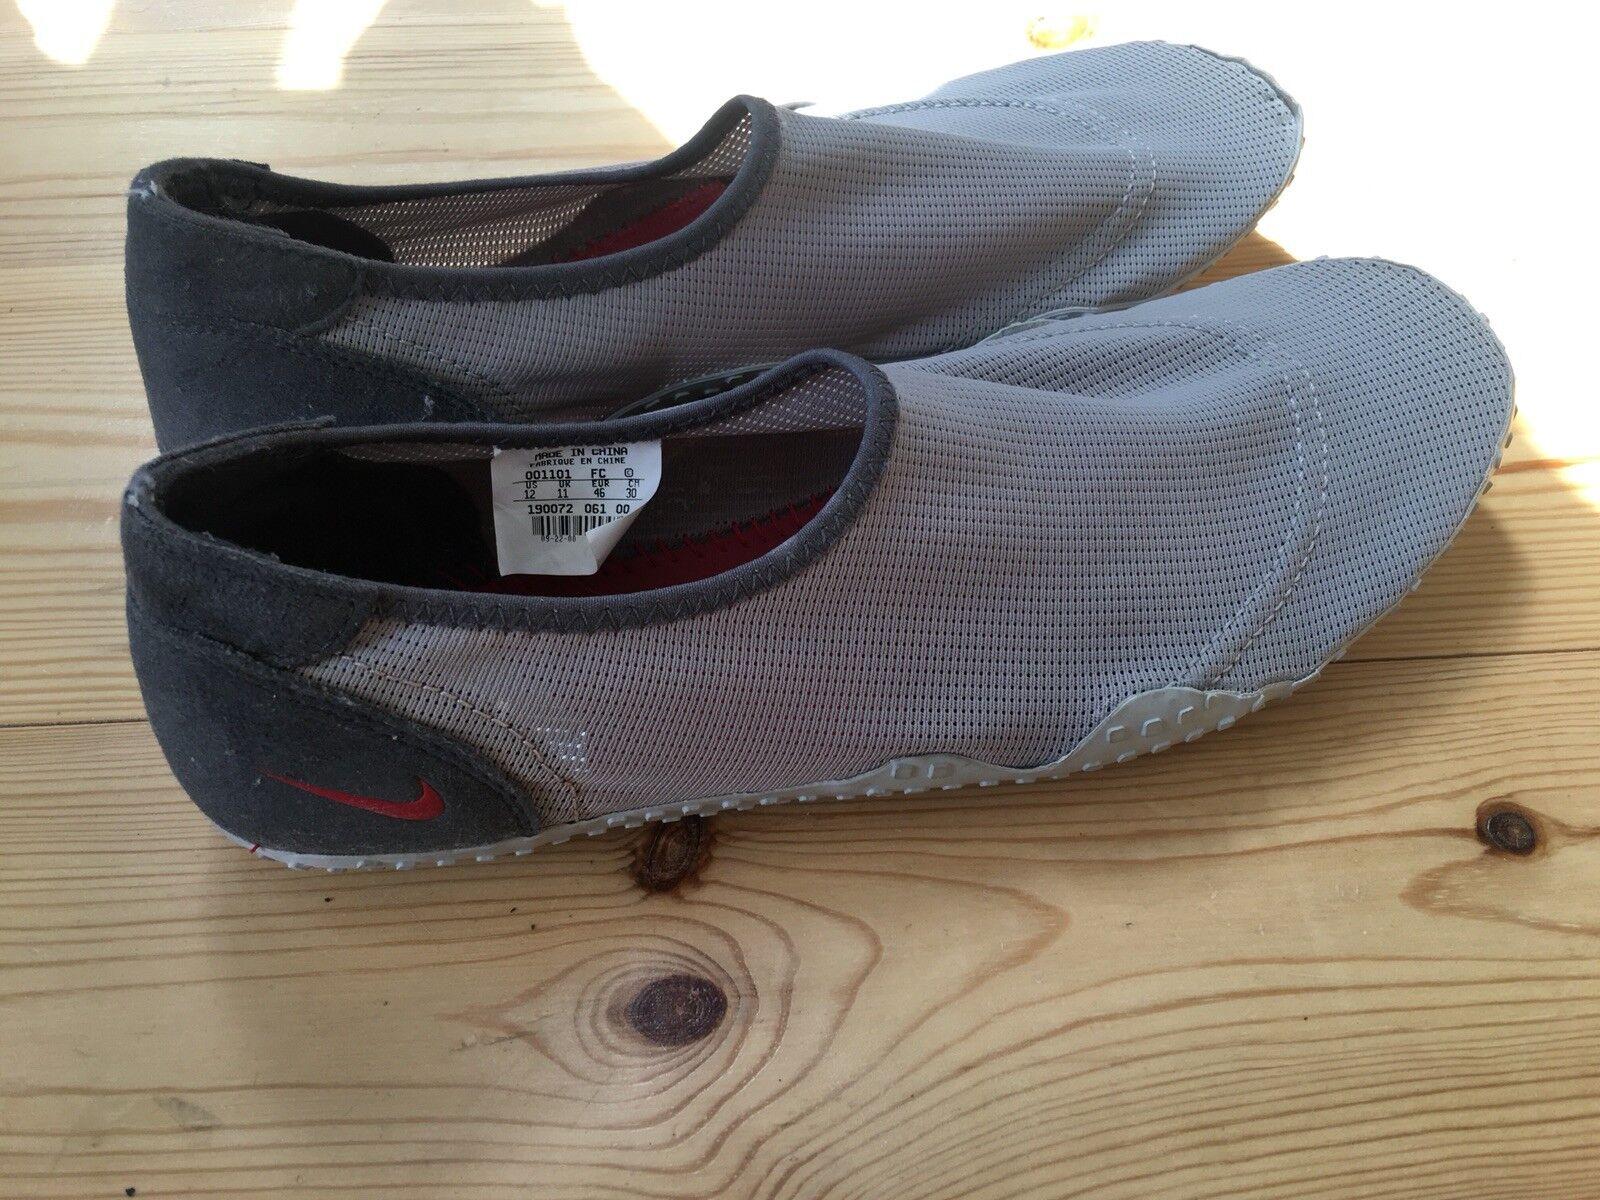 Nike Aqua CALZINO Retrò Classico Scarpe classiche da uomo